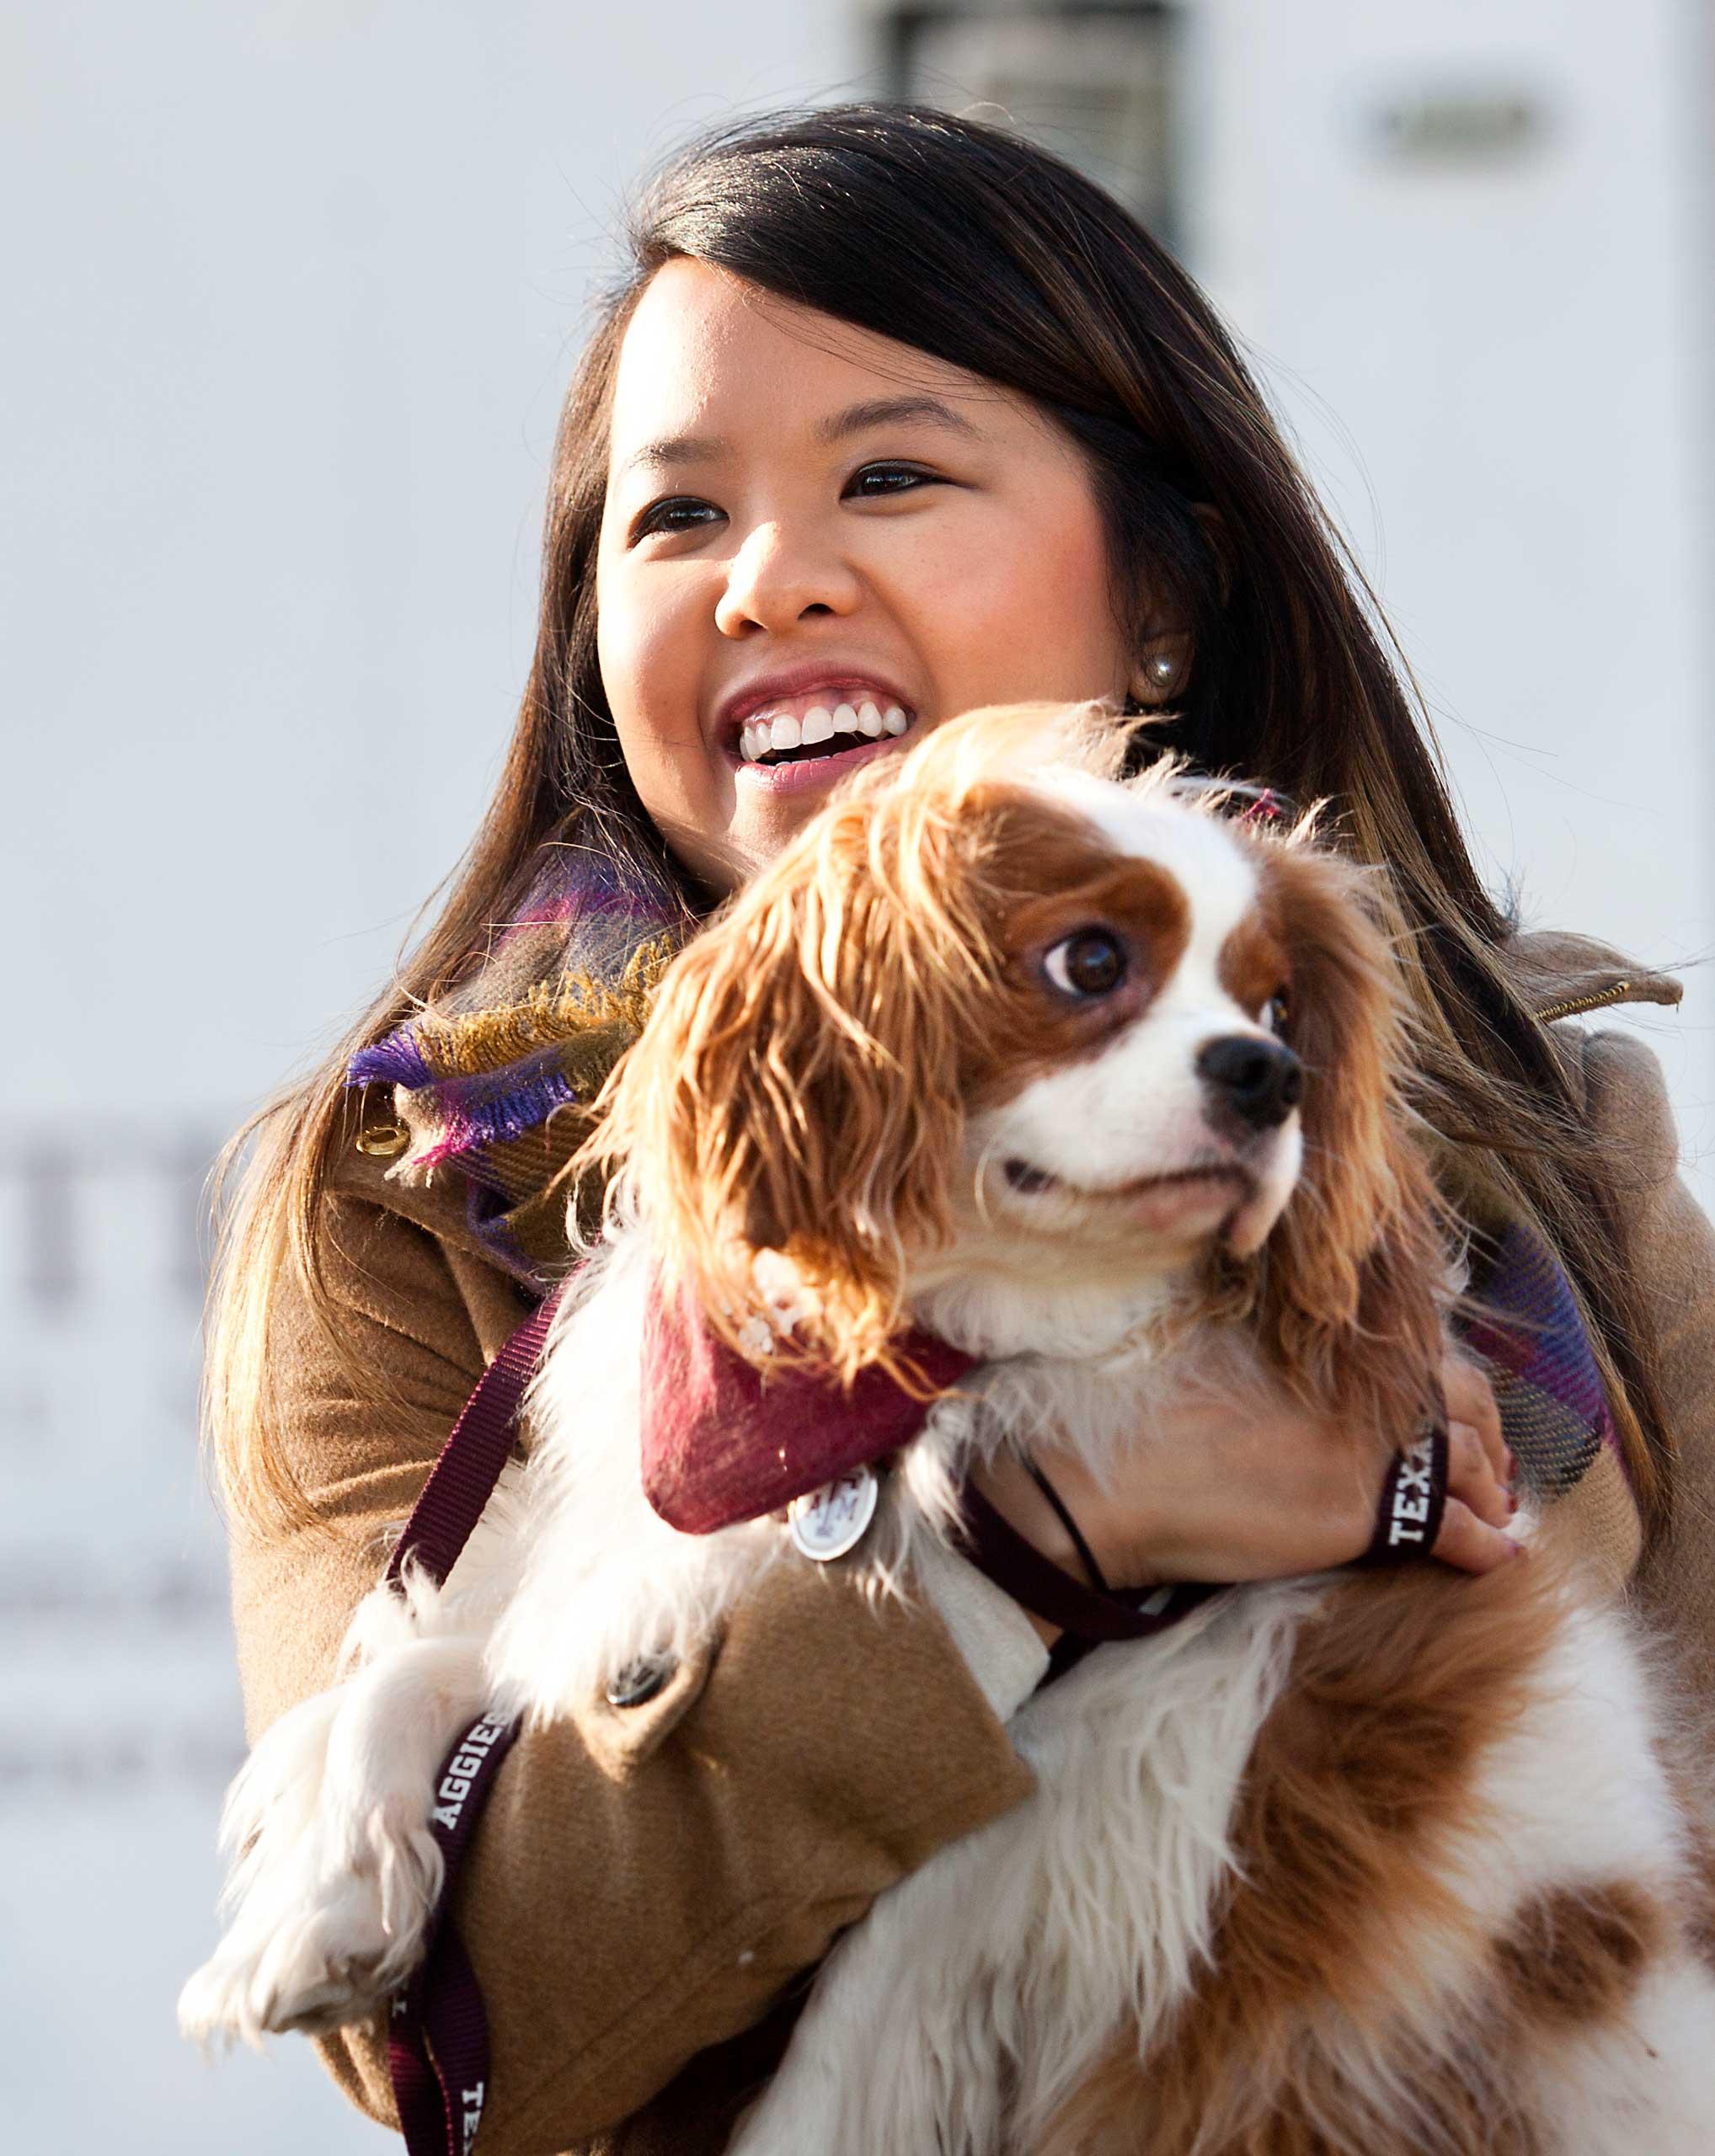 Nina Pham holds up her dog Bentley, at Hensley Field in Grand Prairie, Texas, Nov. 1, 2014.